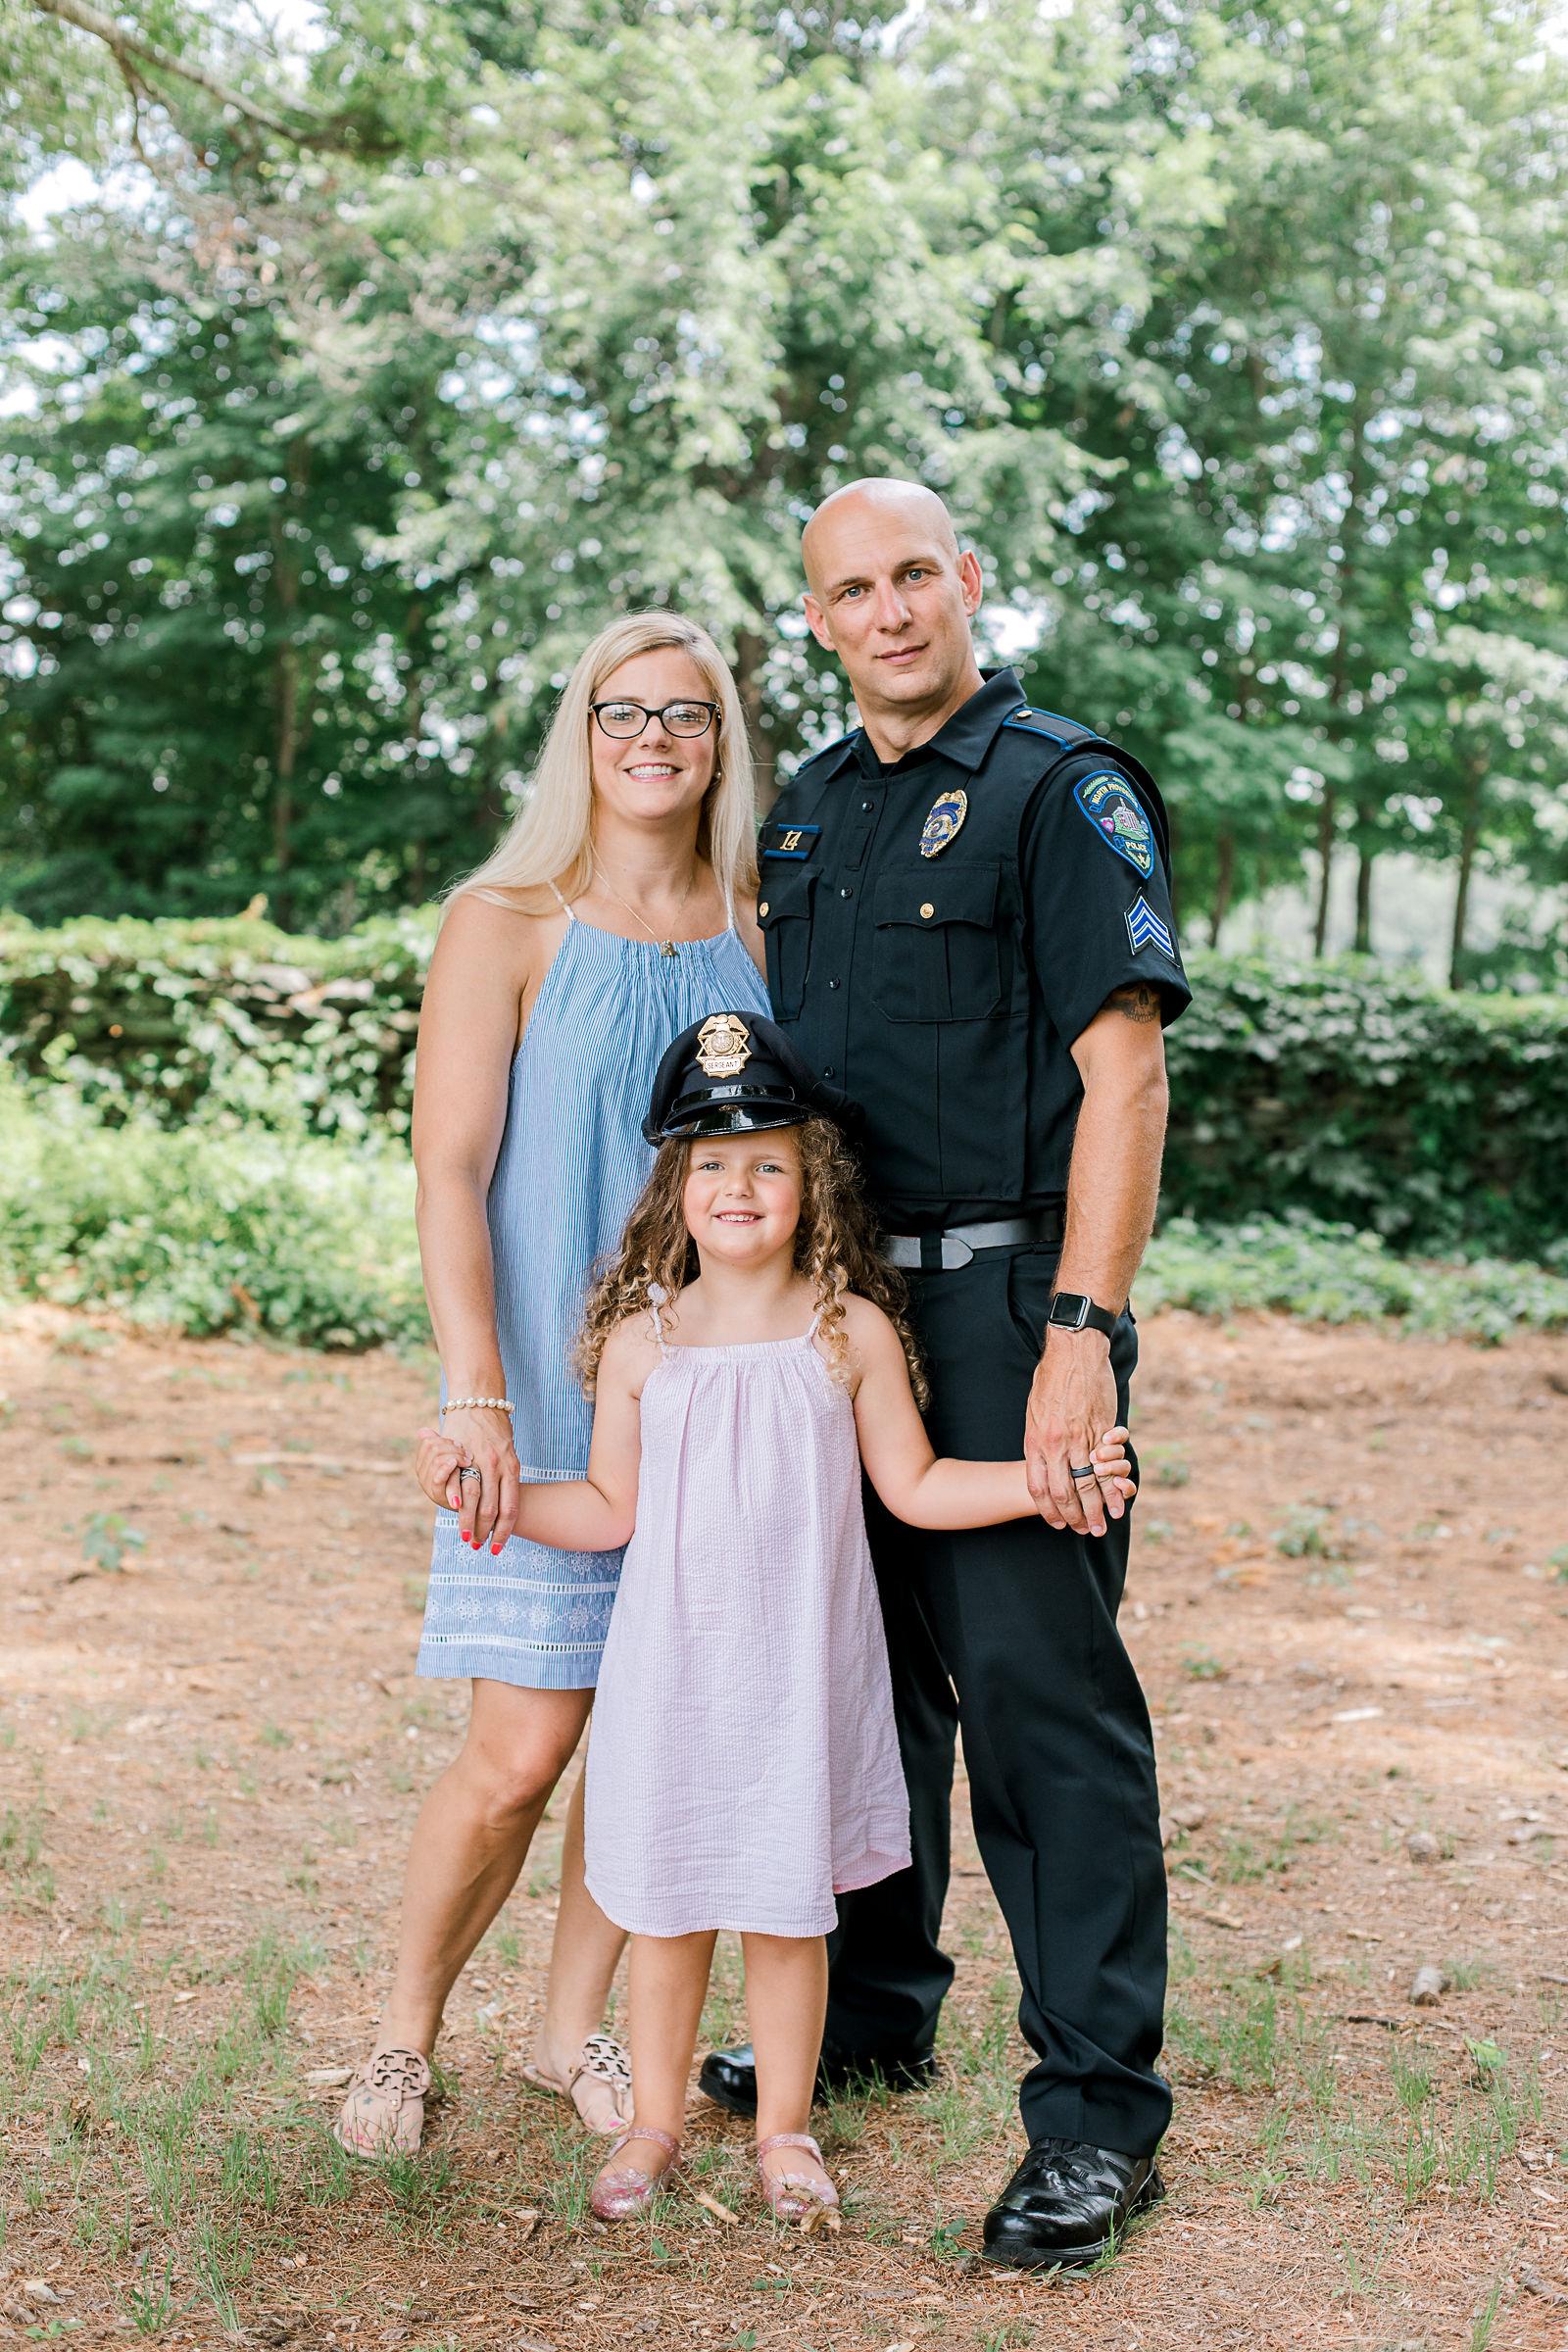 public_safety_family_photos_goddard_park_warwick_RI_erica_pezente_photography(67).jpg